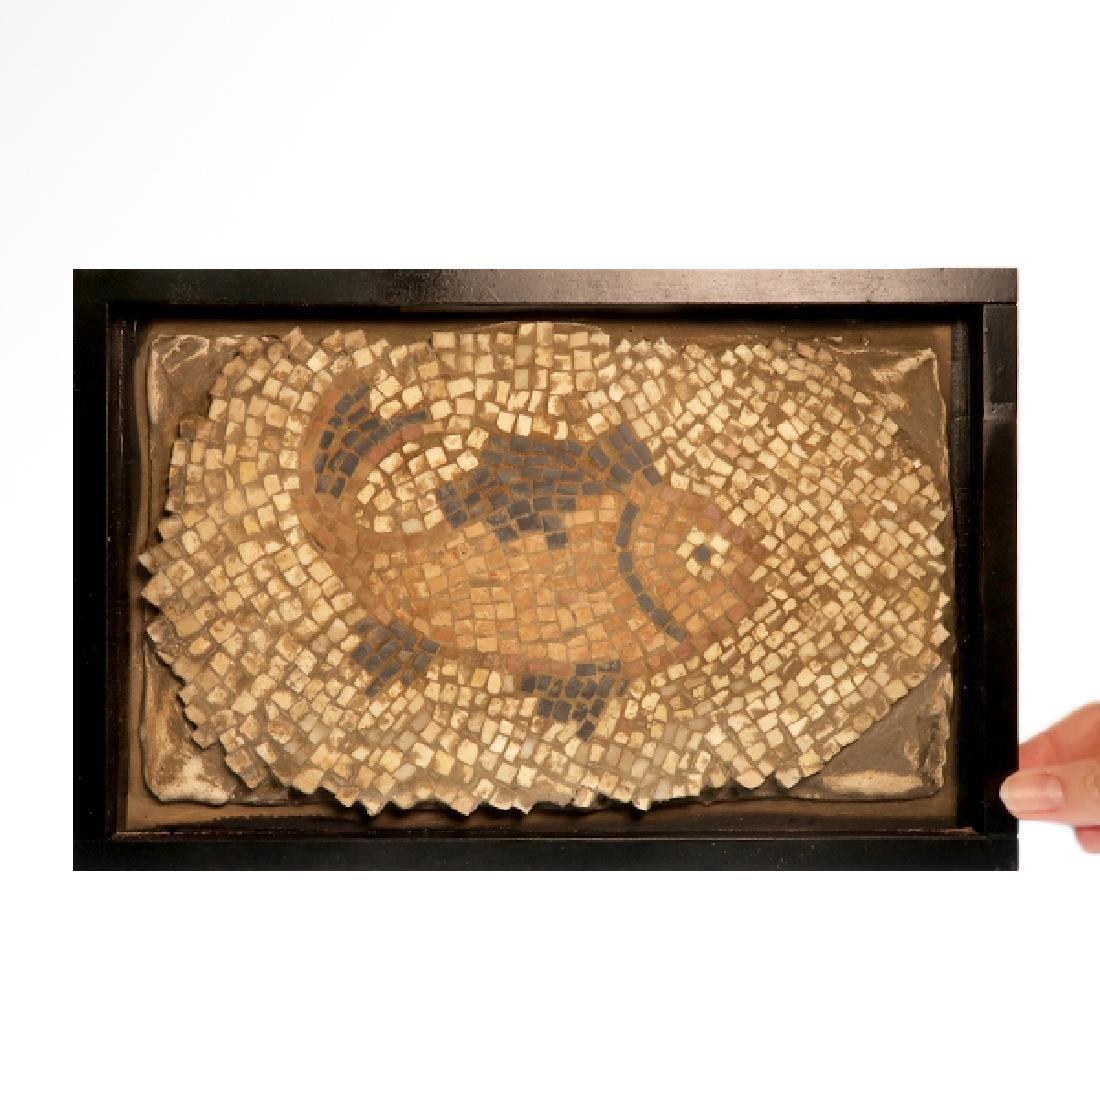 Roman Mosaic Panel with Fish, c. 4th-6th Century A.D. - 3